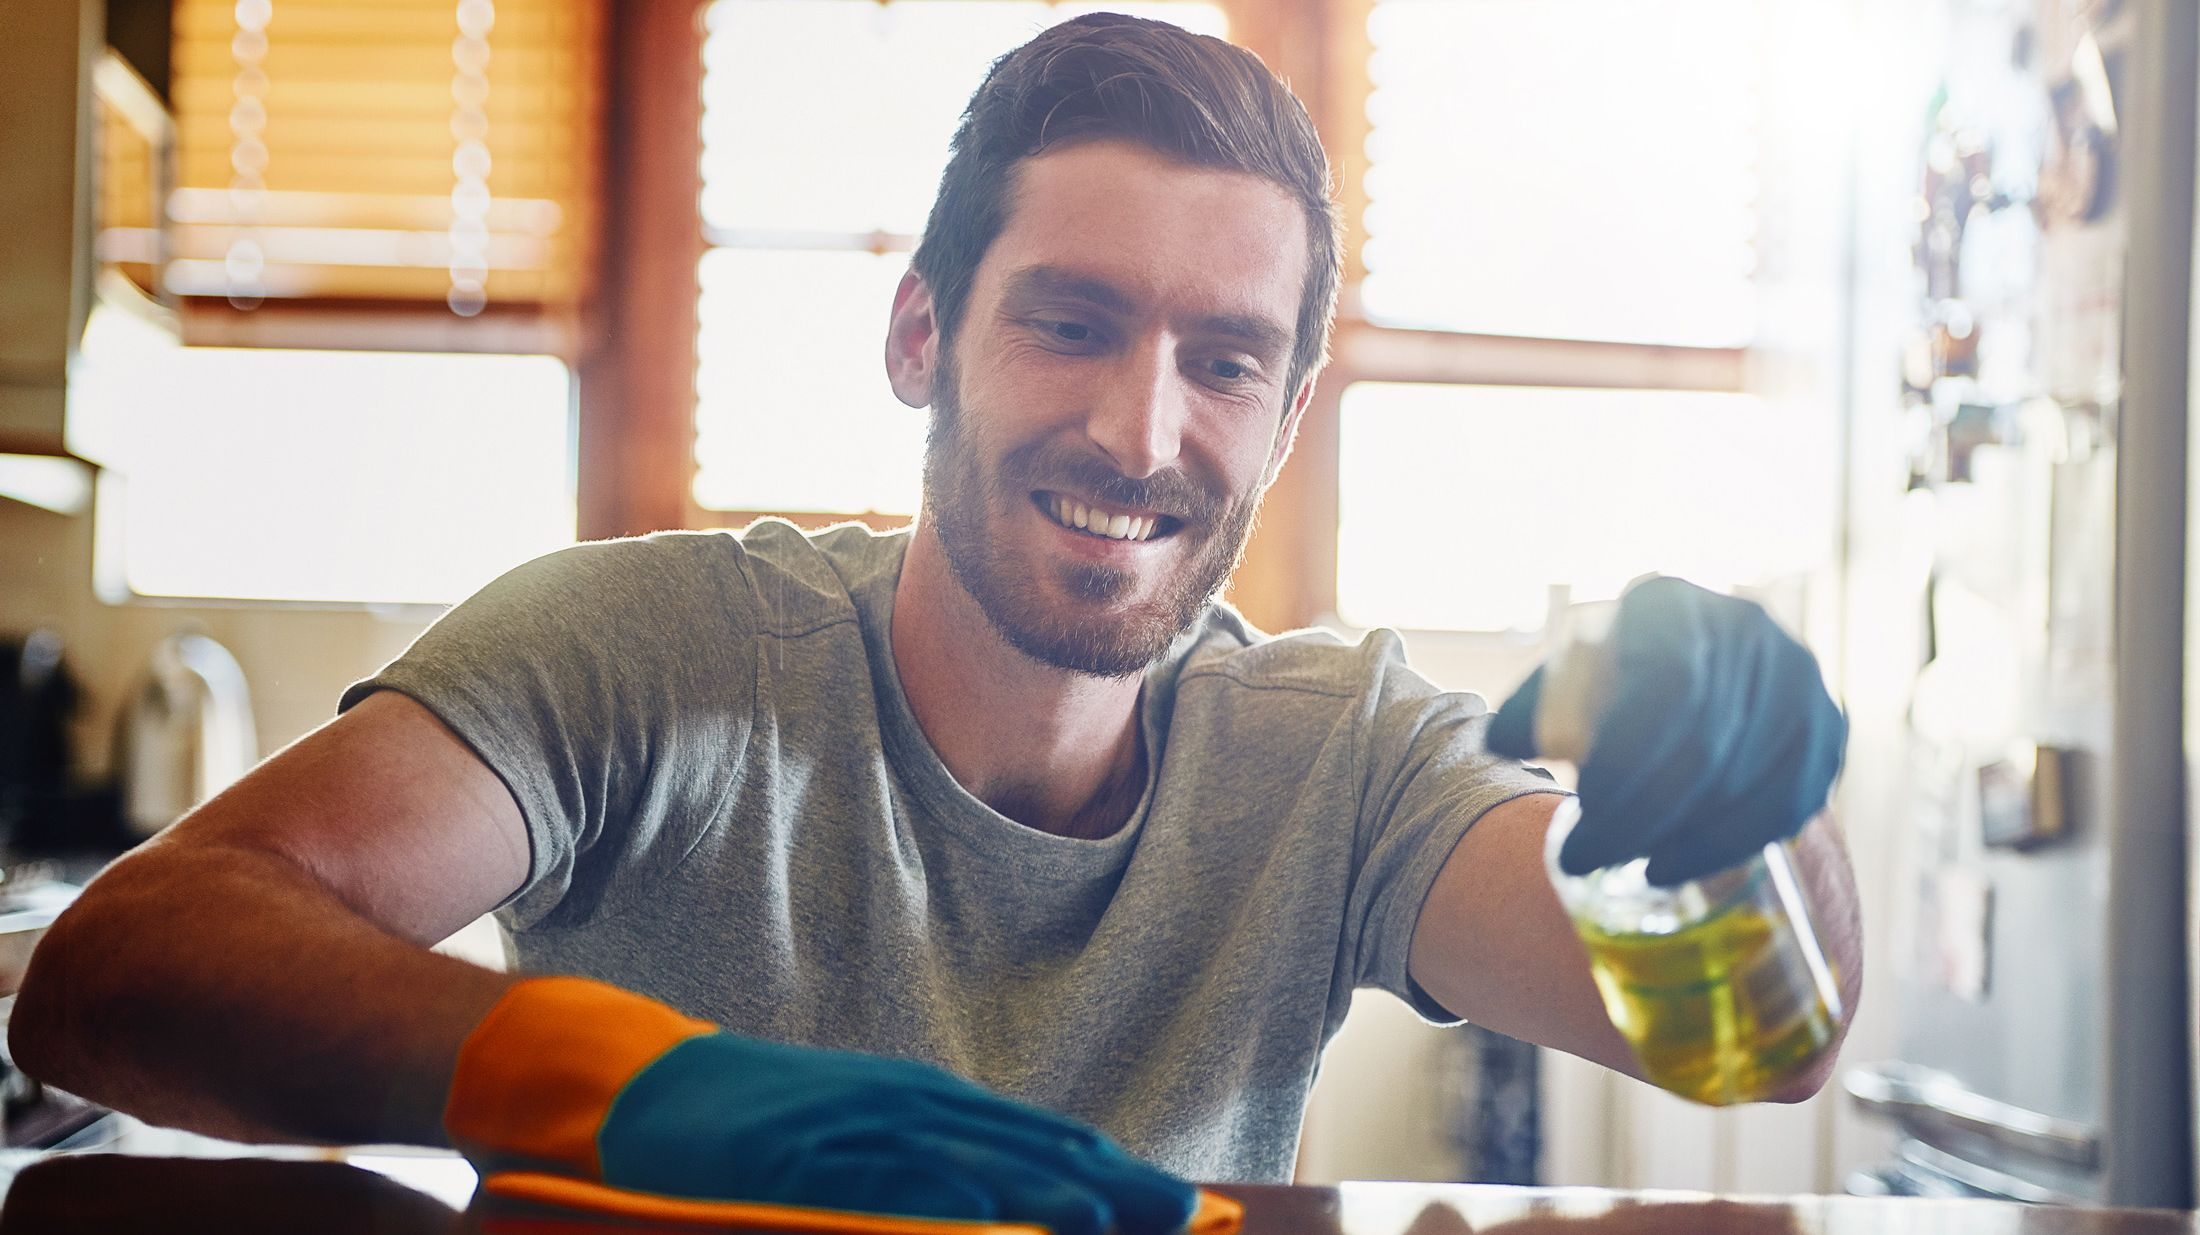 Life Hacks to Make 8 Household Chores Easier